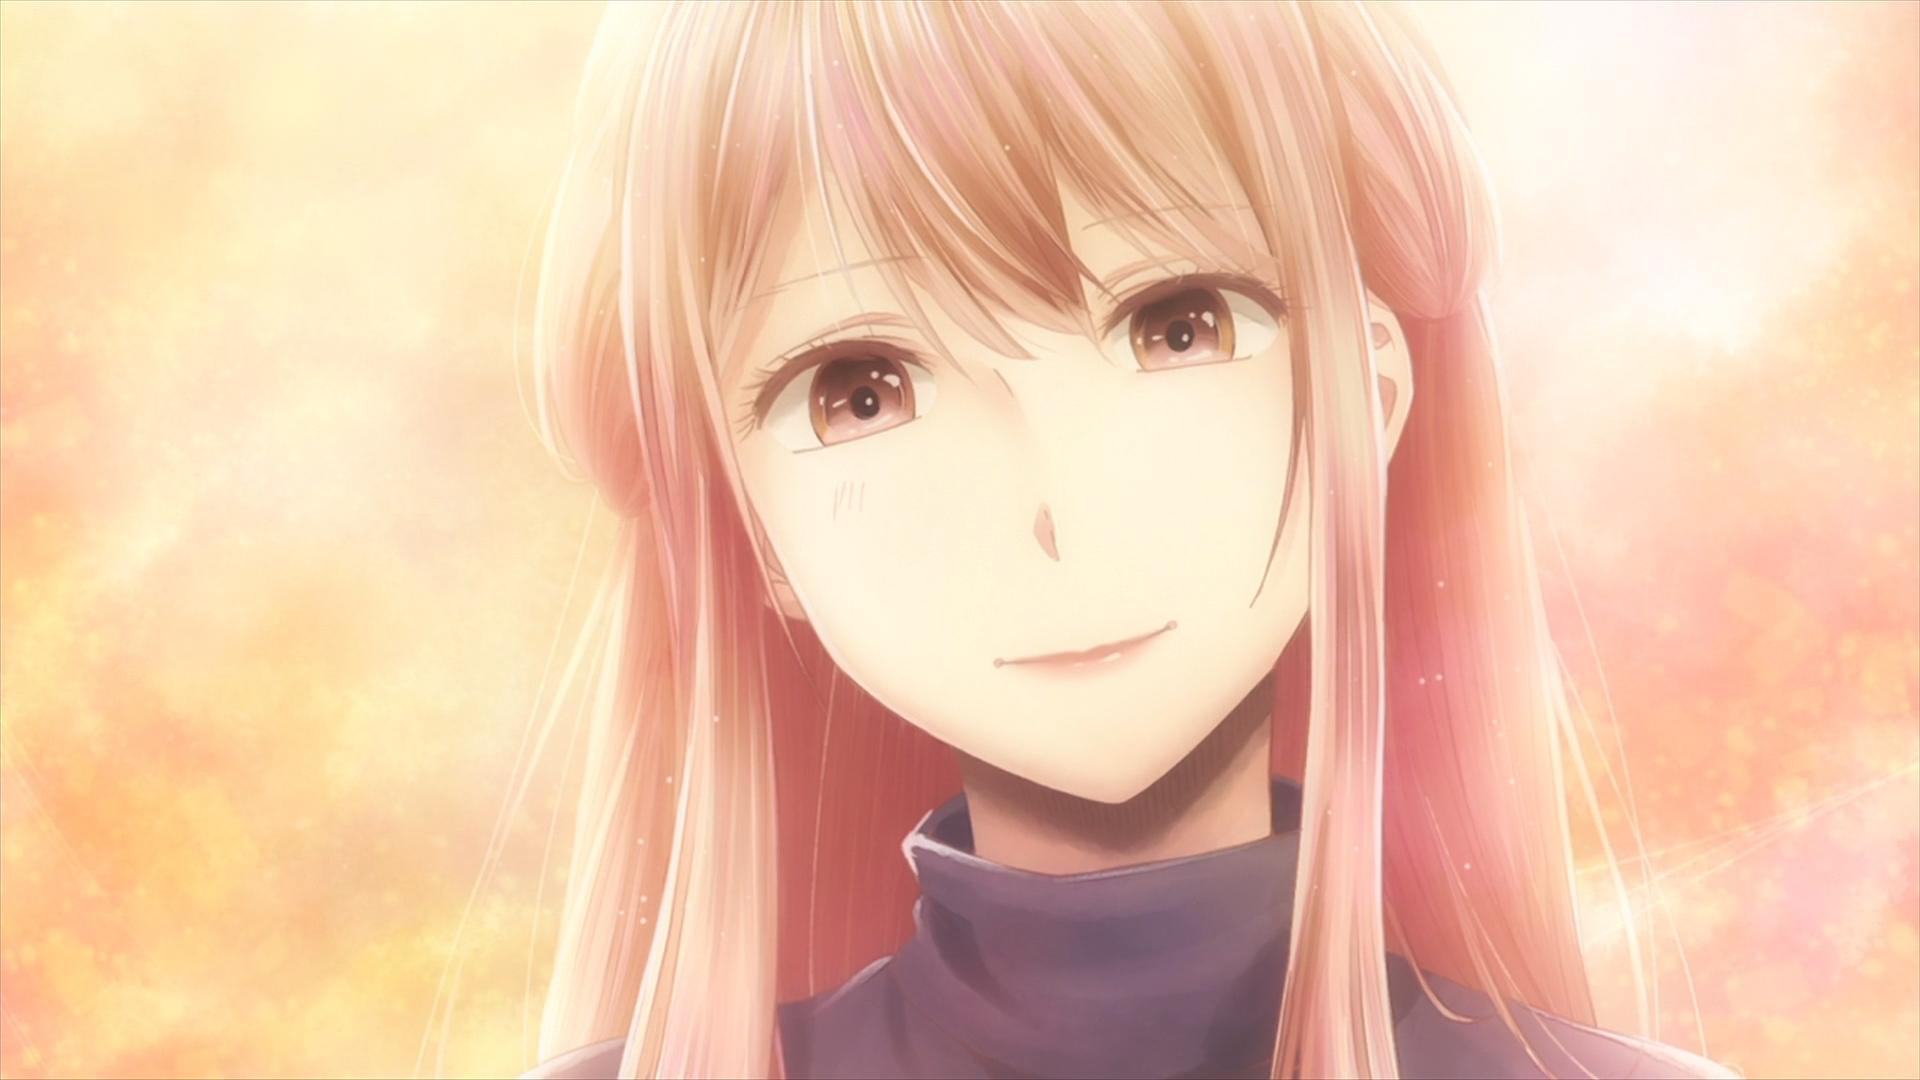 Kuzu No Honkai Episode 11 Akane Finally Content In Her Love And With Herself